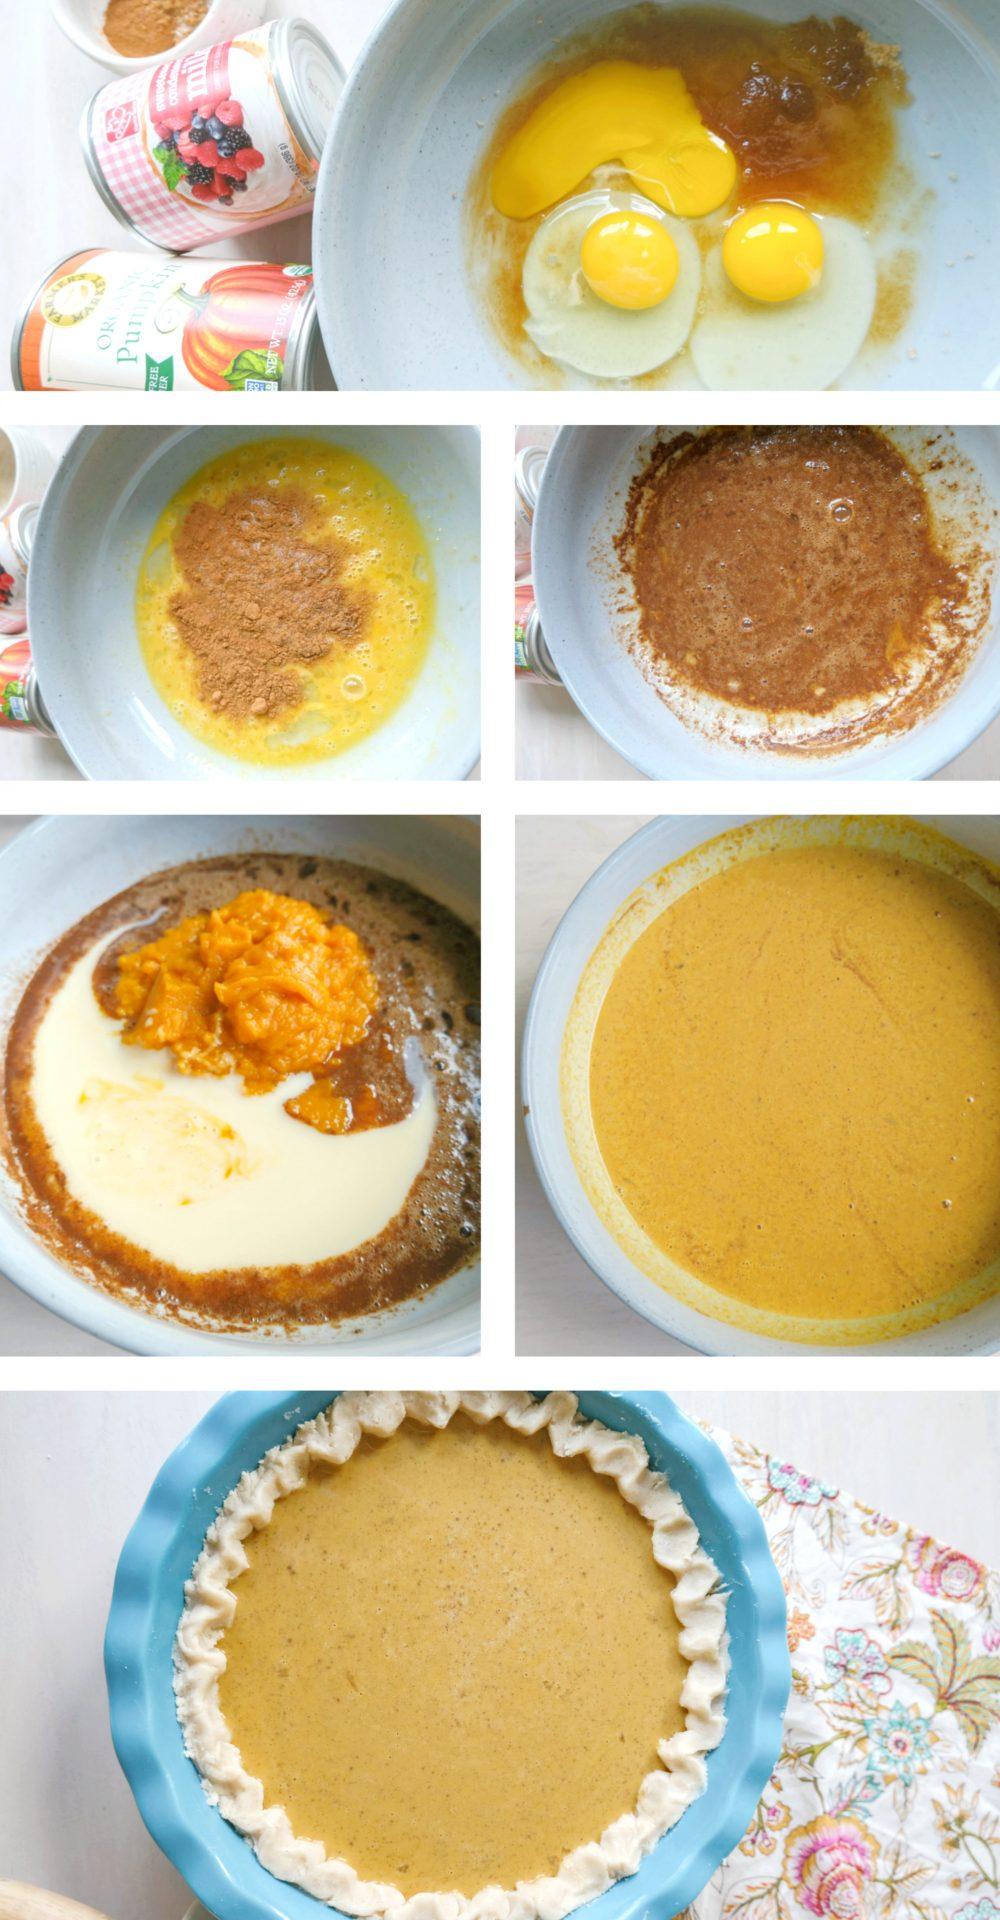 gluten free, pumpkin pie, delicious gluten-free pumpkin pie, thanksgiving, baking, fall, flaky gluten-free pumpkin pie, gluten-free pie crust